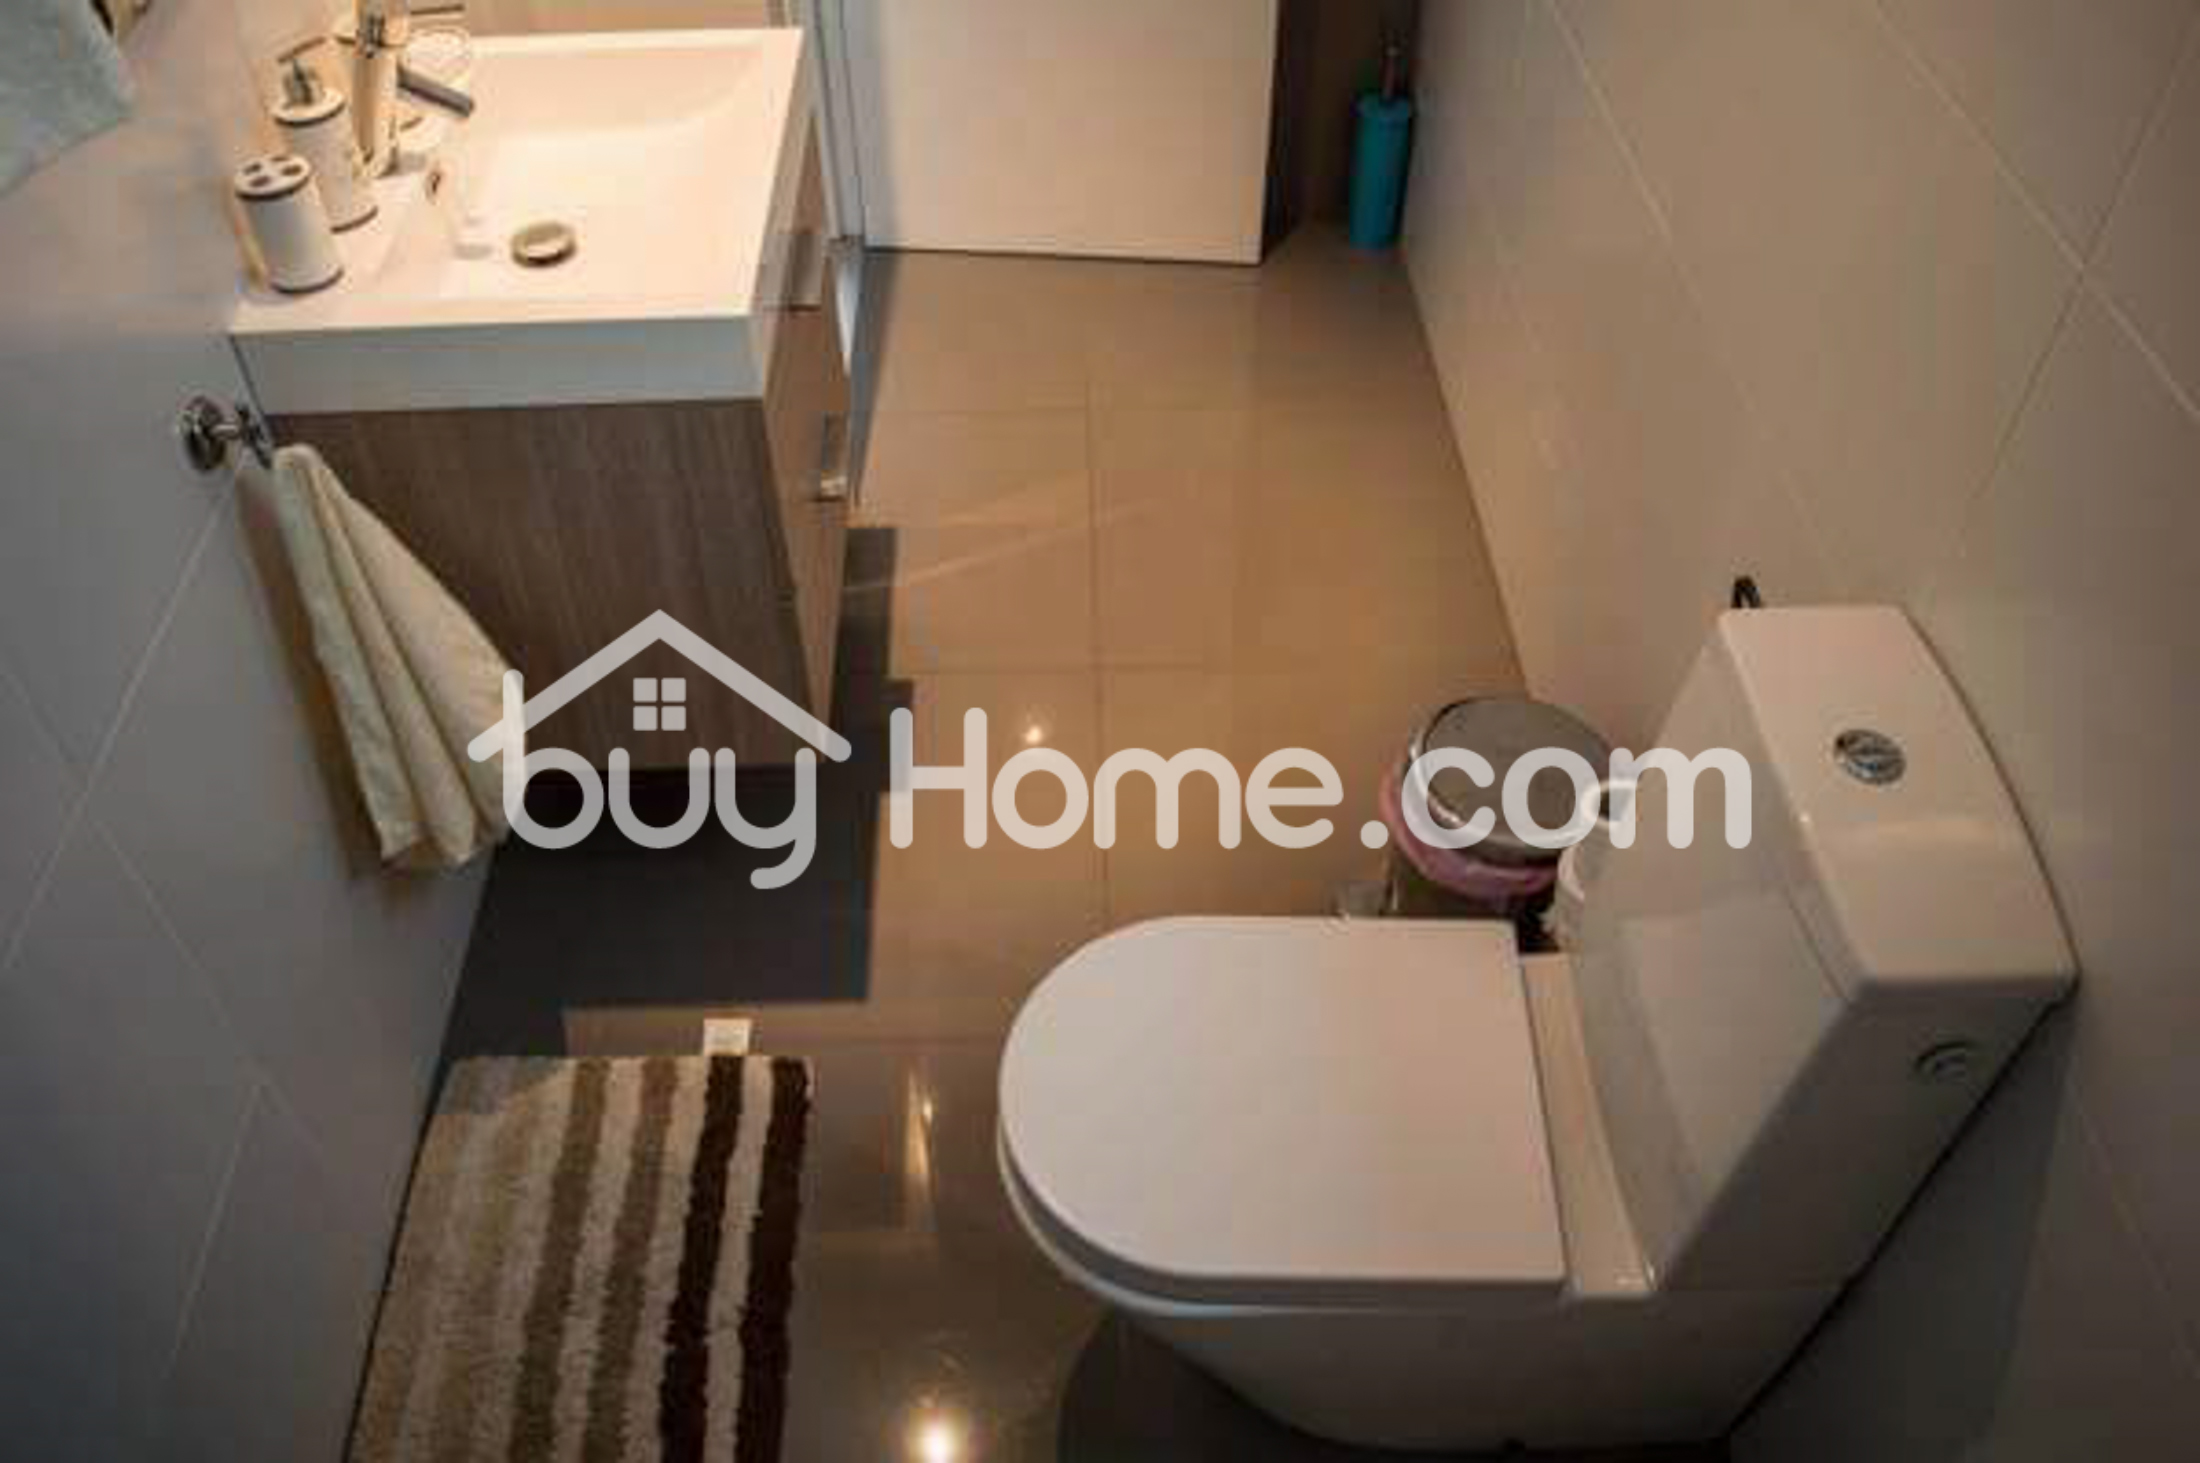 2 Bedroom Duplex Penthouse | BuyHome